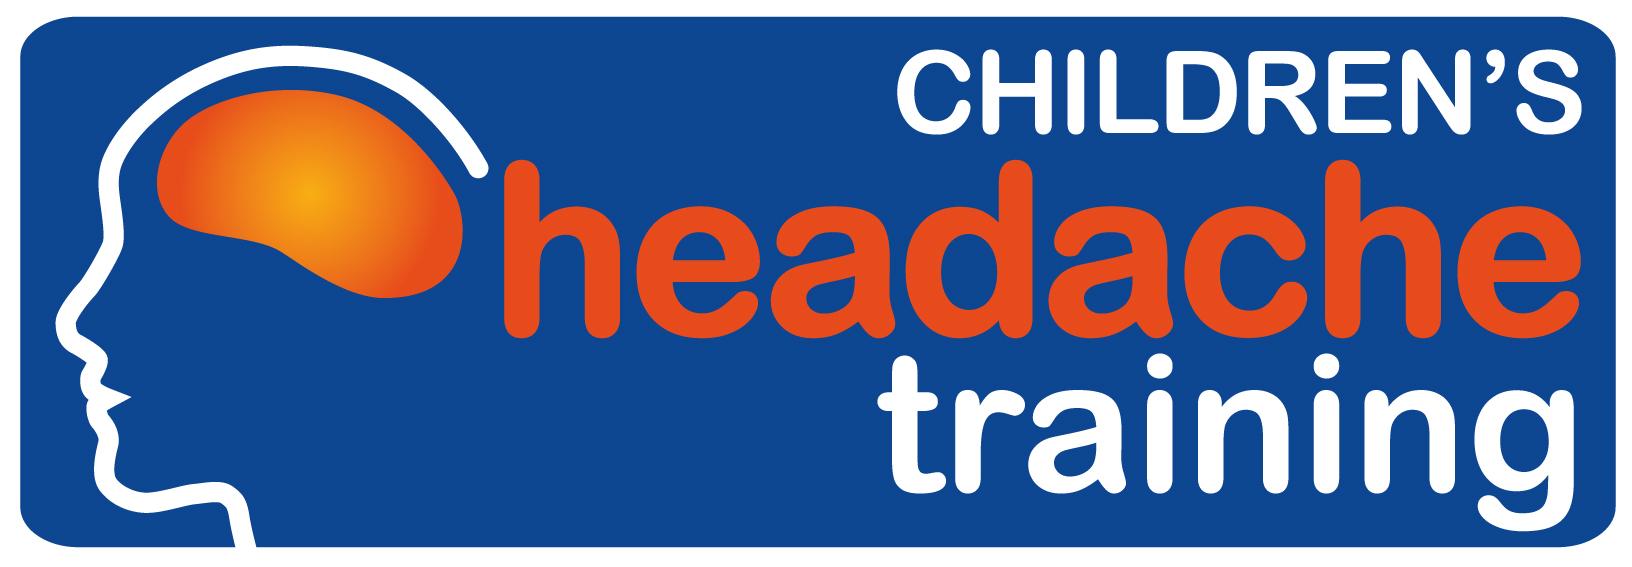 CHaT London (Children's Headache Training) – Friday 3 November 2017